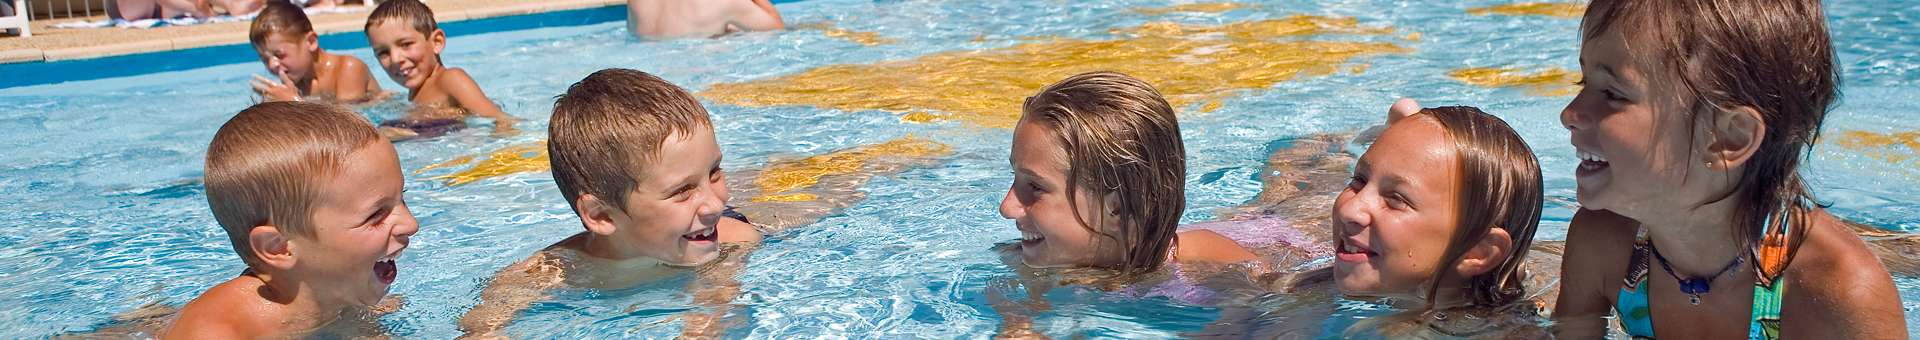 piscine-943